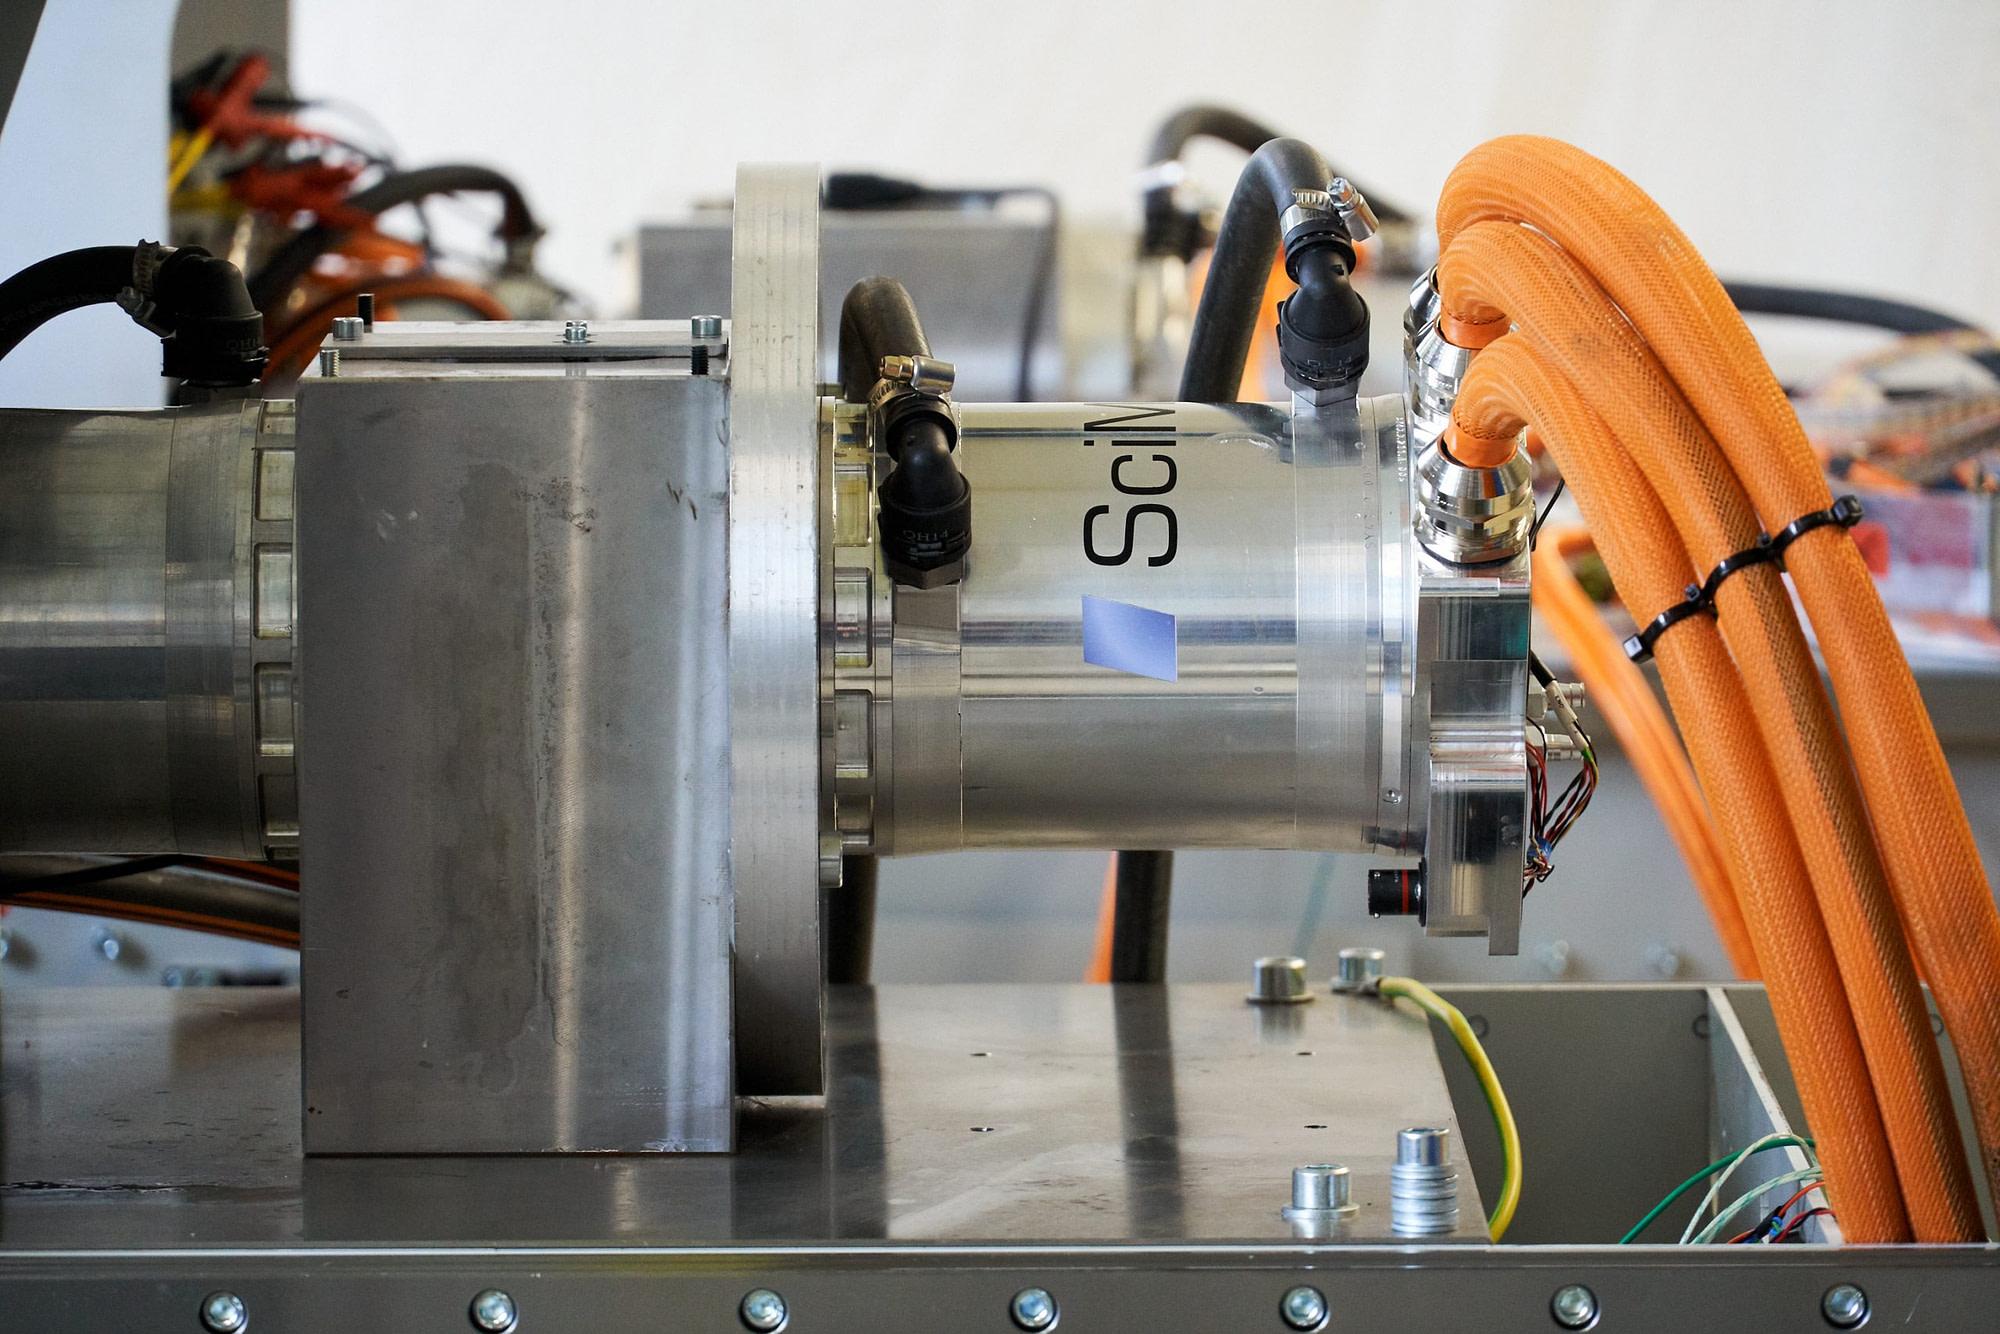 Test bench motors